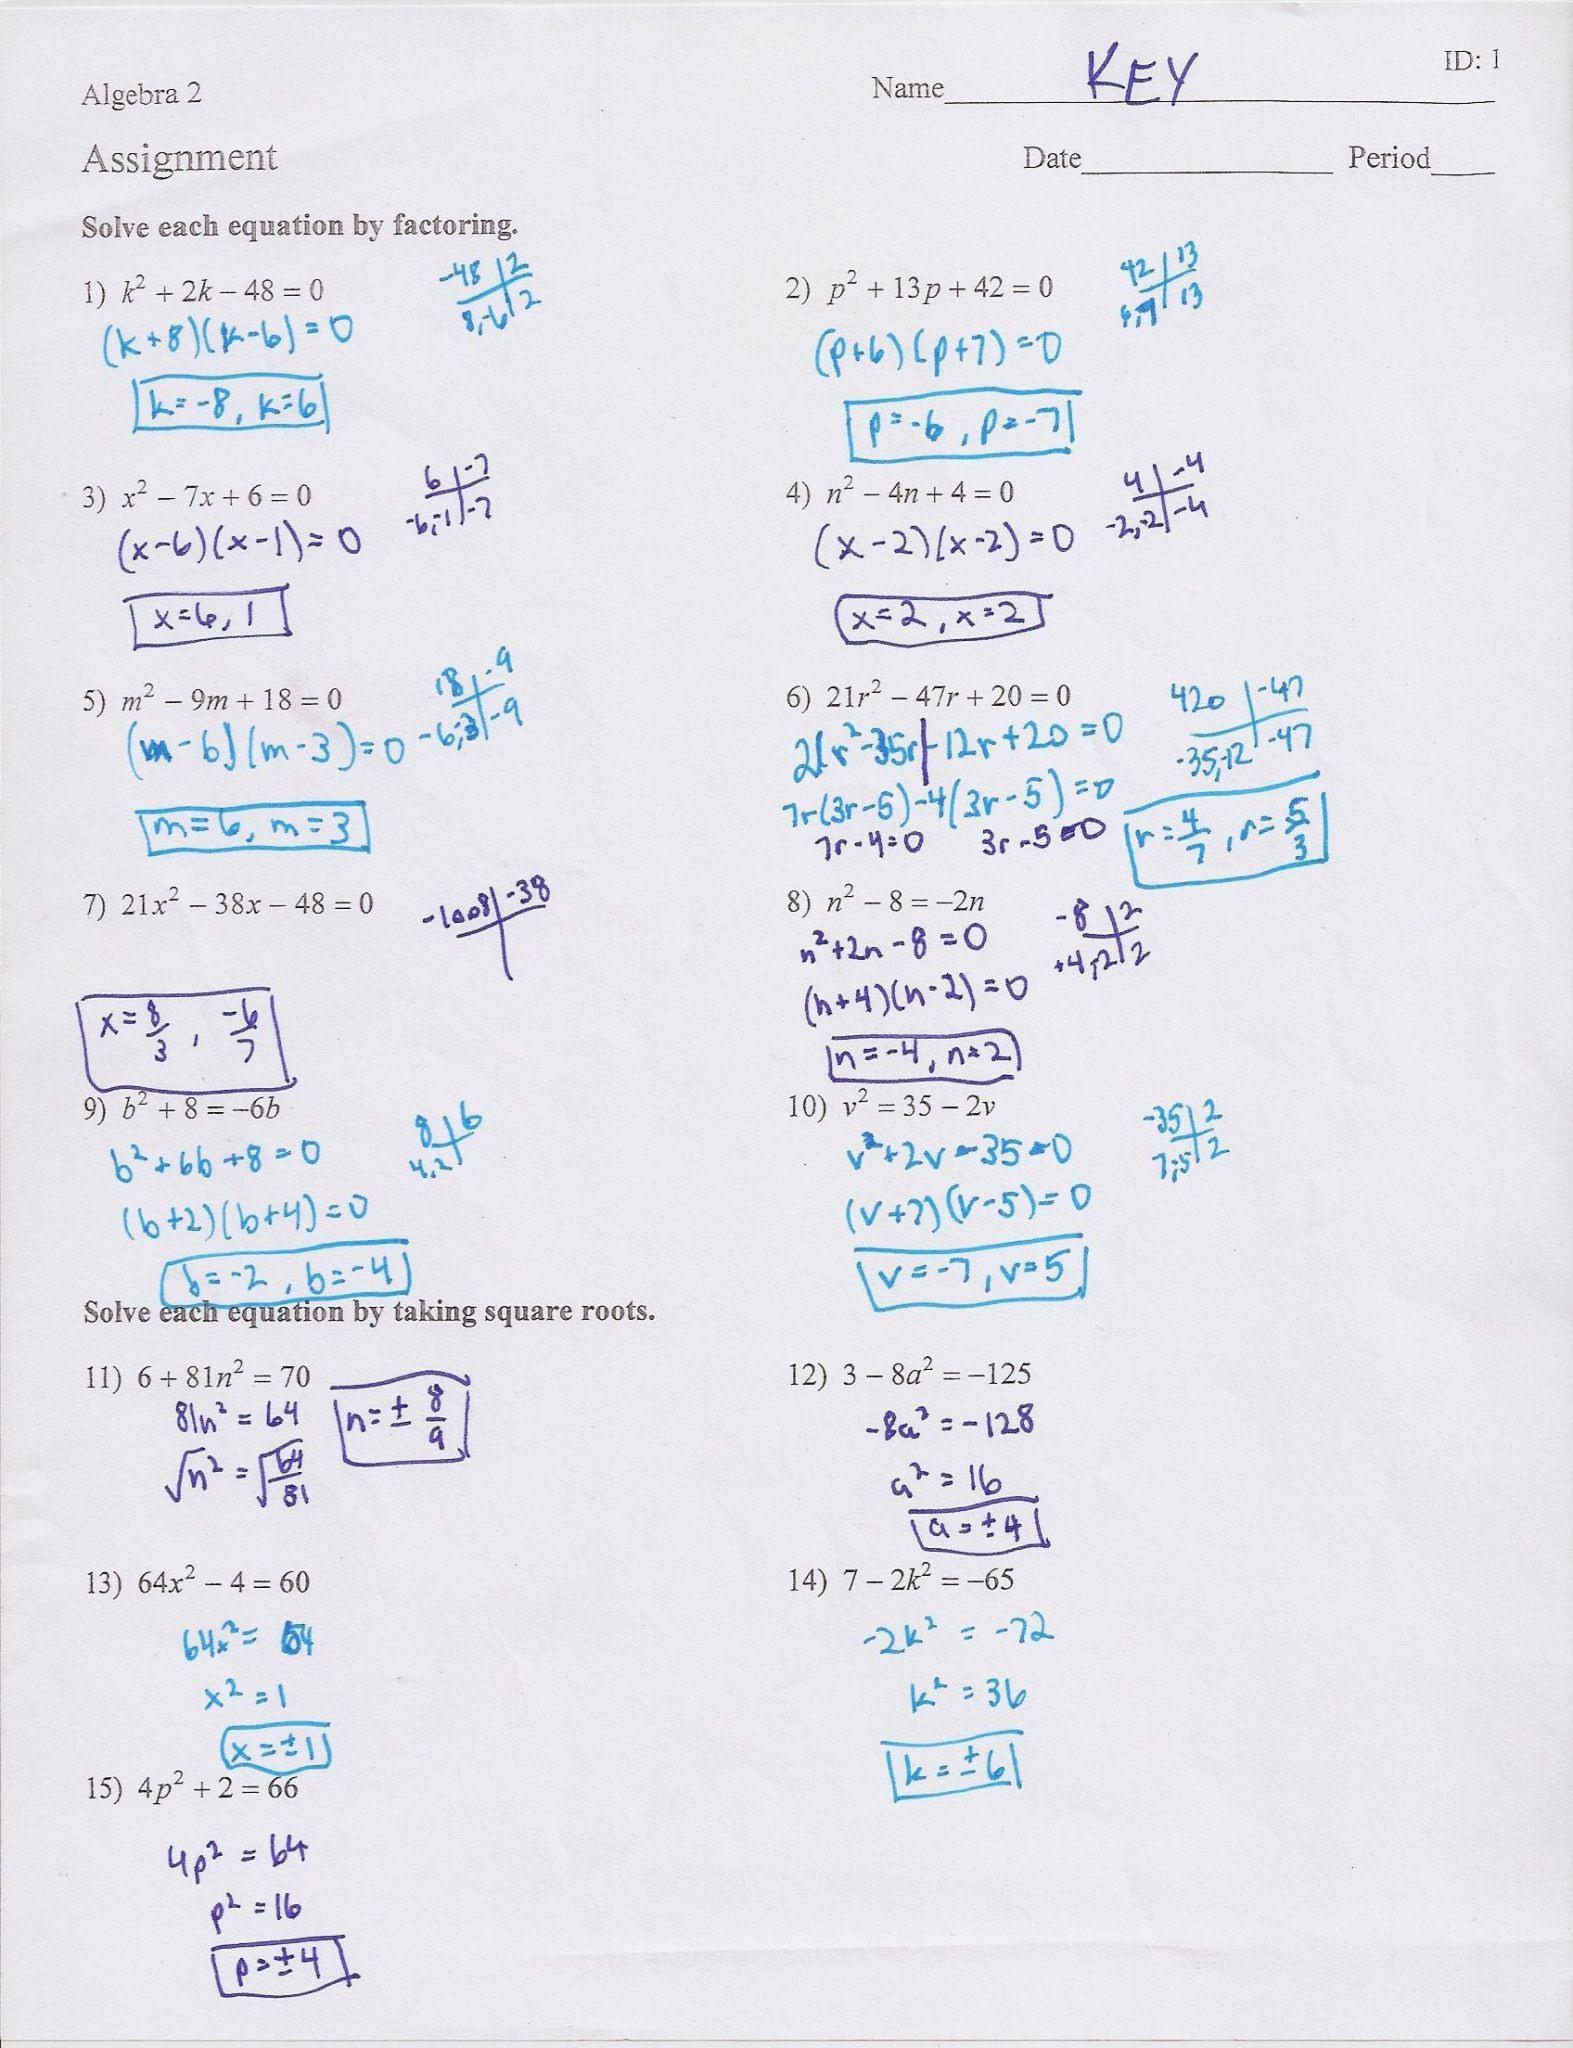 Algebra 2 Quadratic Formula Worksheet Answers — db excel.com